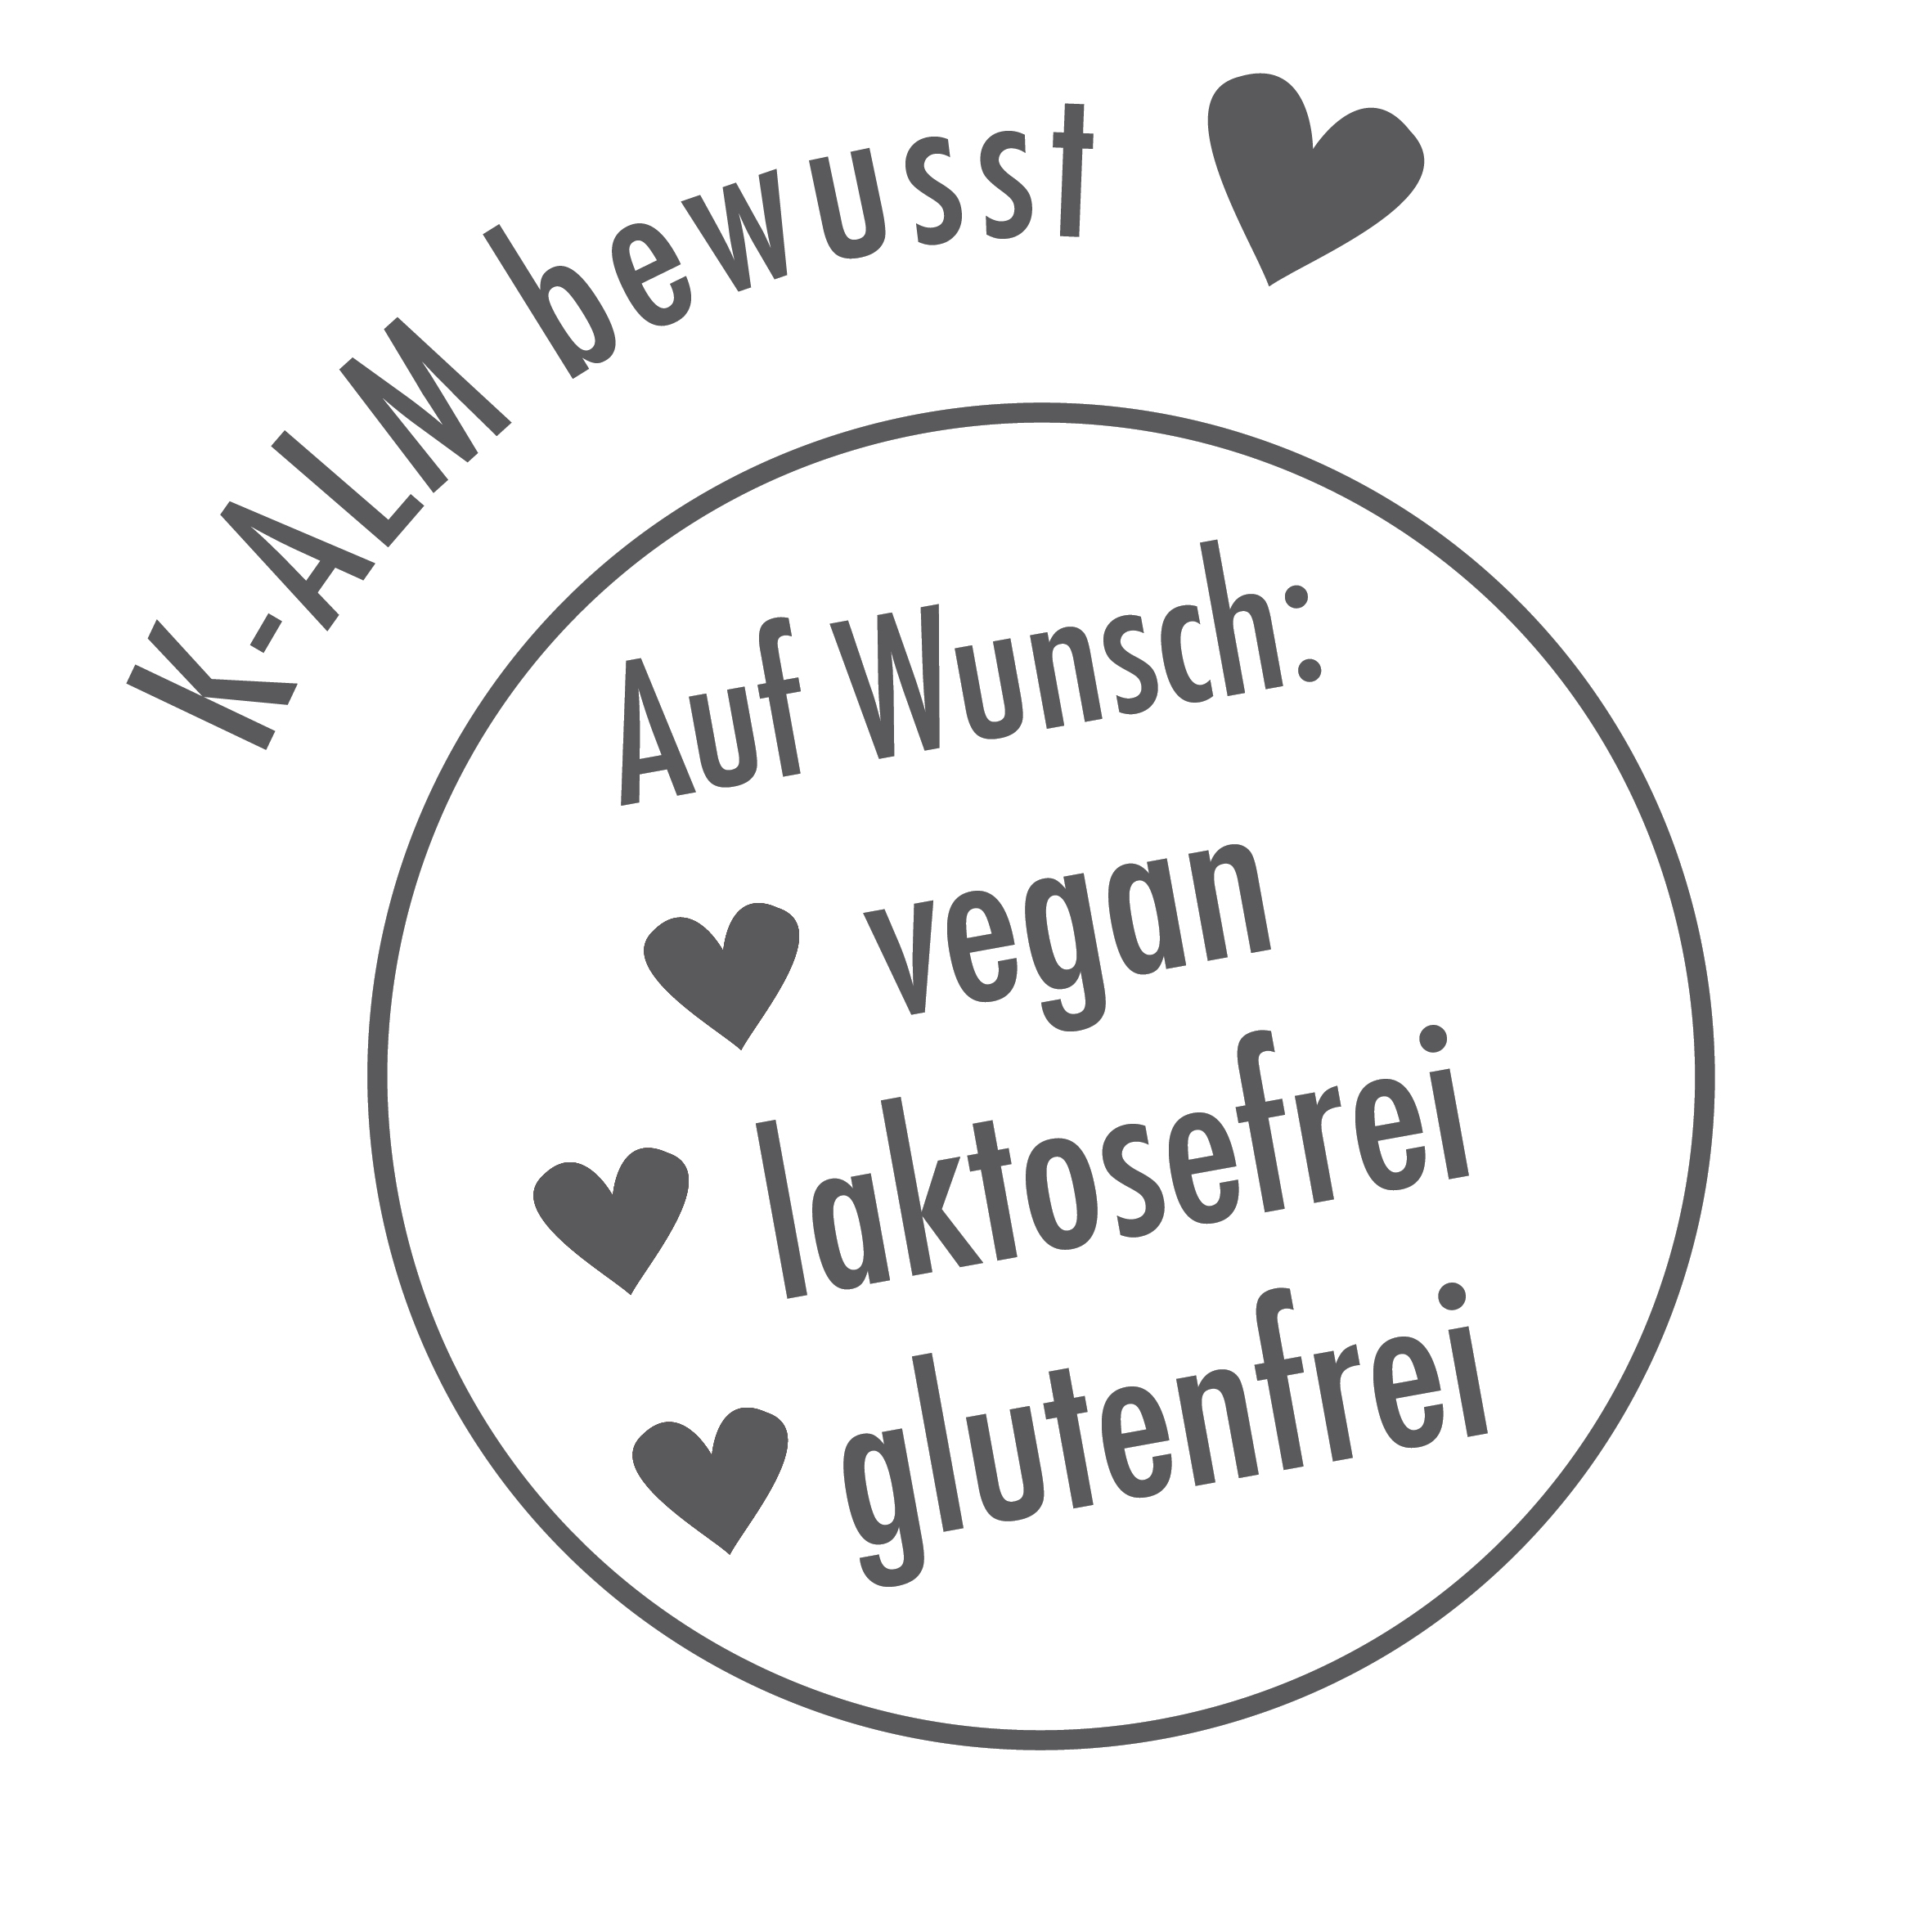 vegan - laktosefrei - glutenfrei